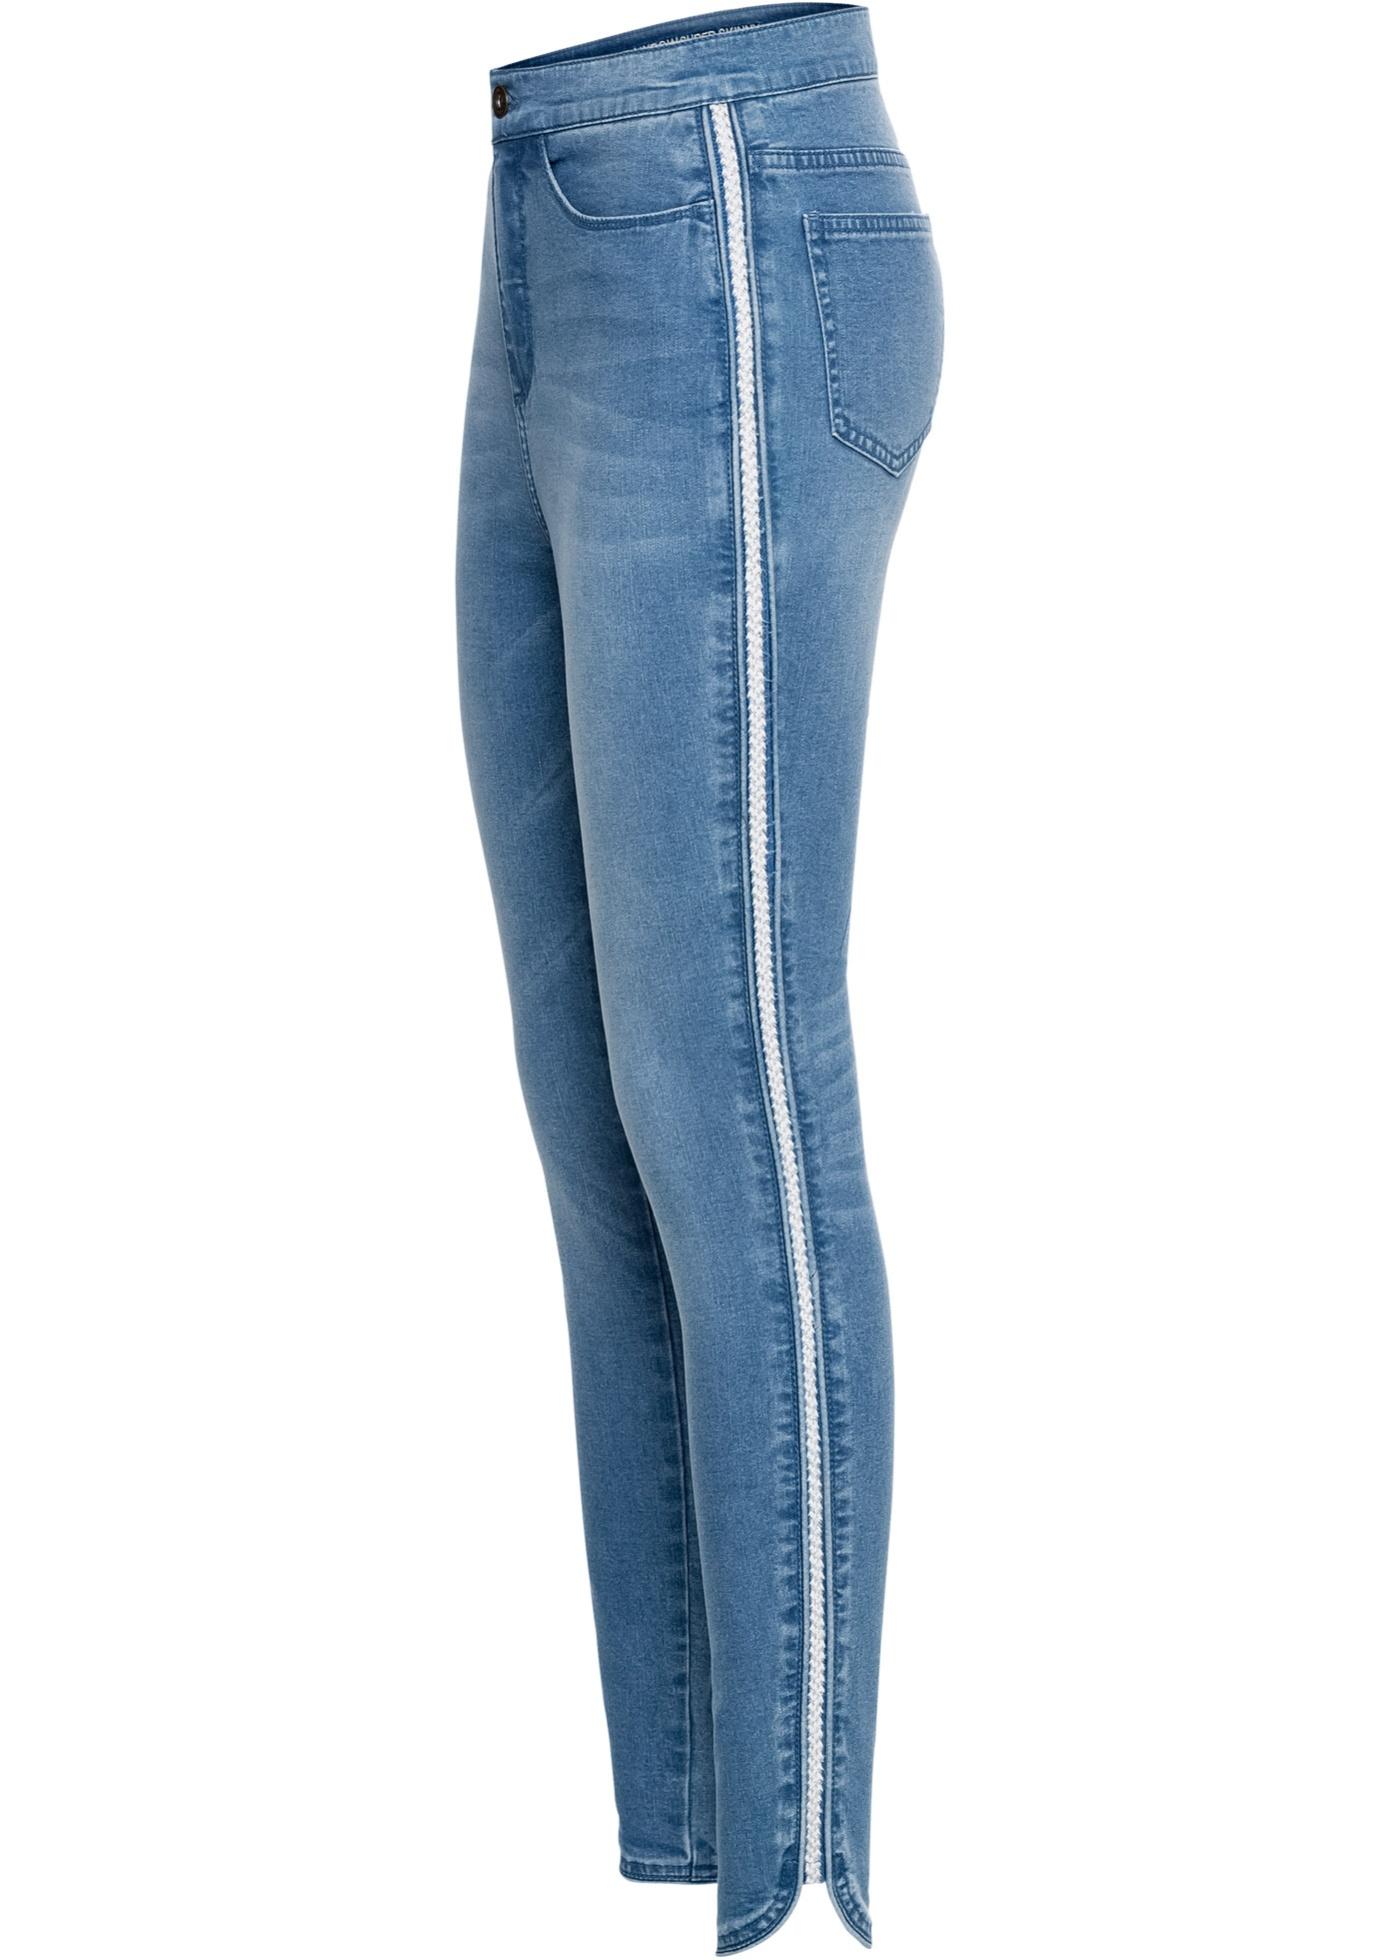 Super-Skinny-Jeans mit Glitzereinsatz